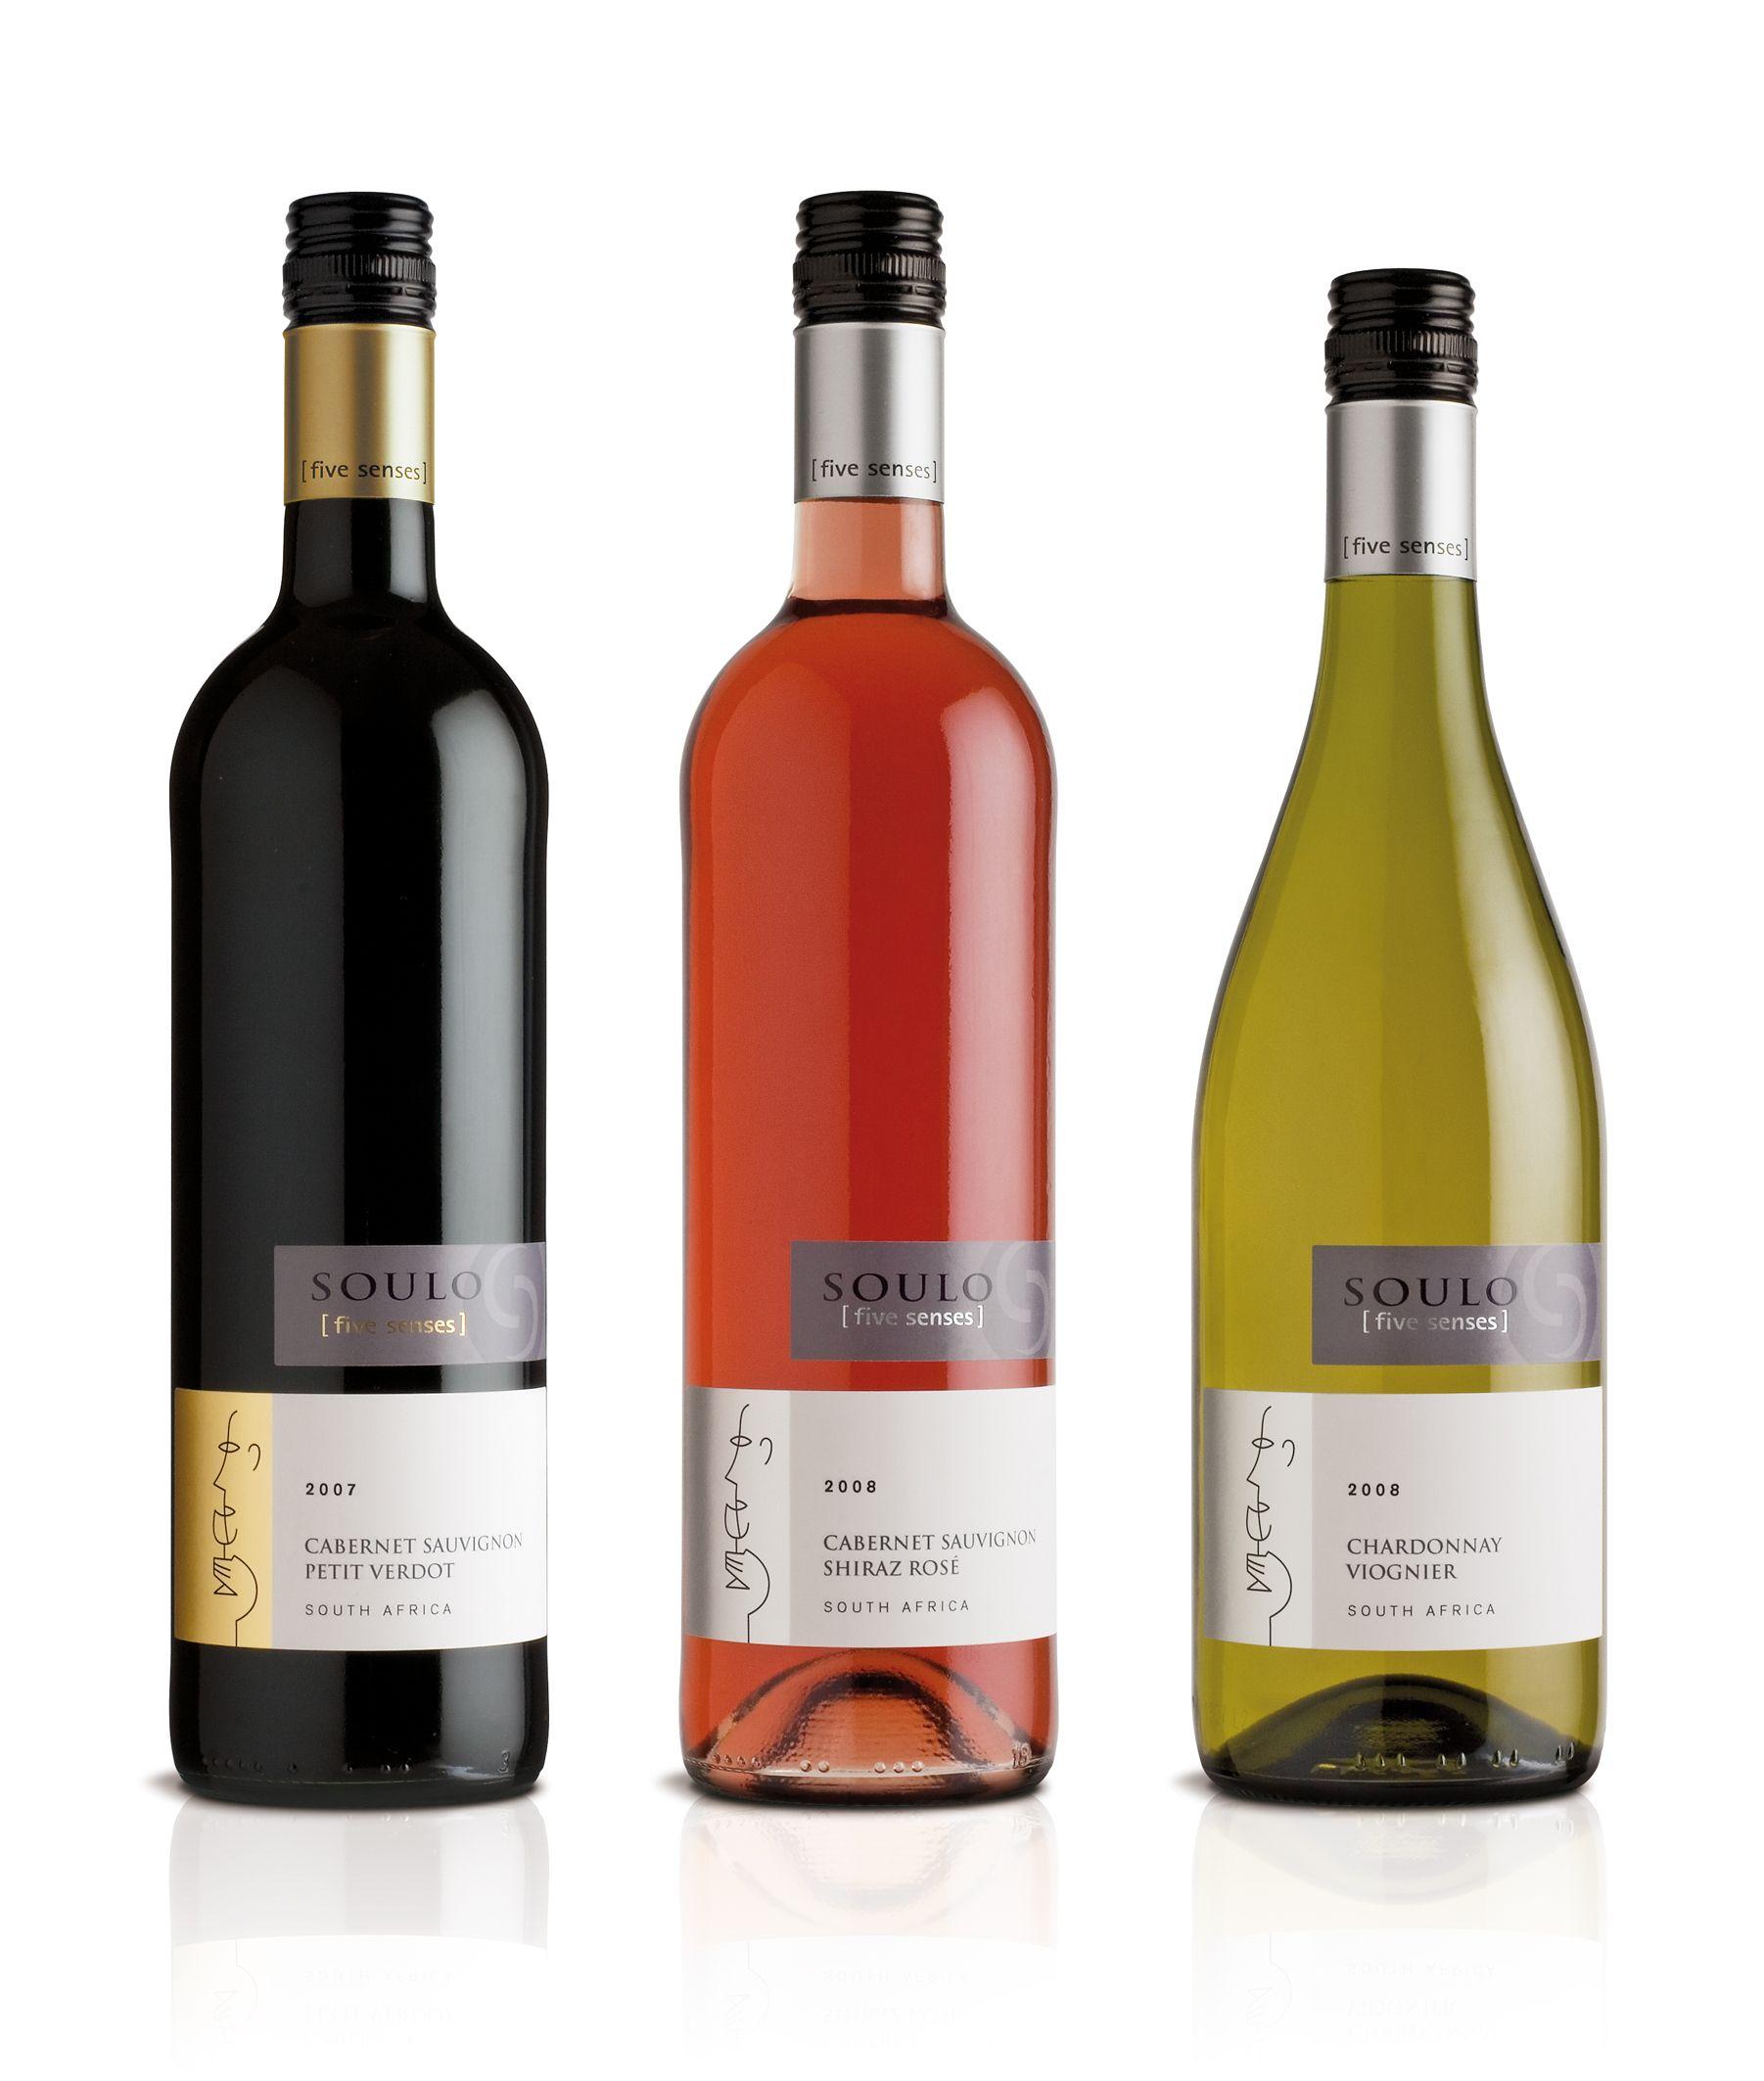 Soulo Five Senses Modern South African For Uk Multiple Rose Wine Bottle Wines Wine Bottle